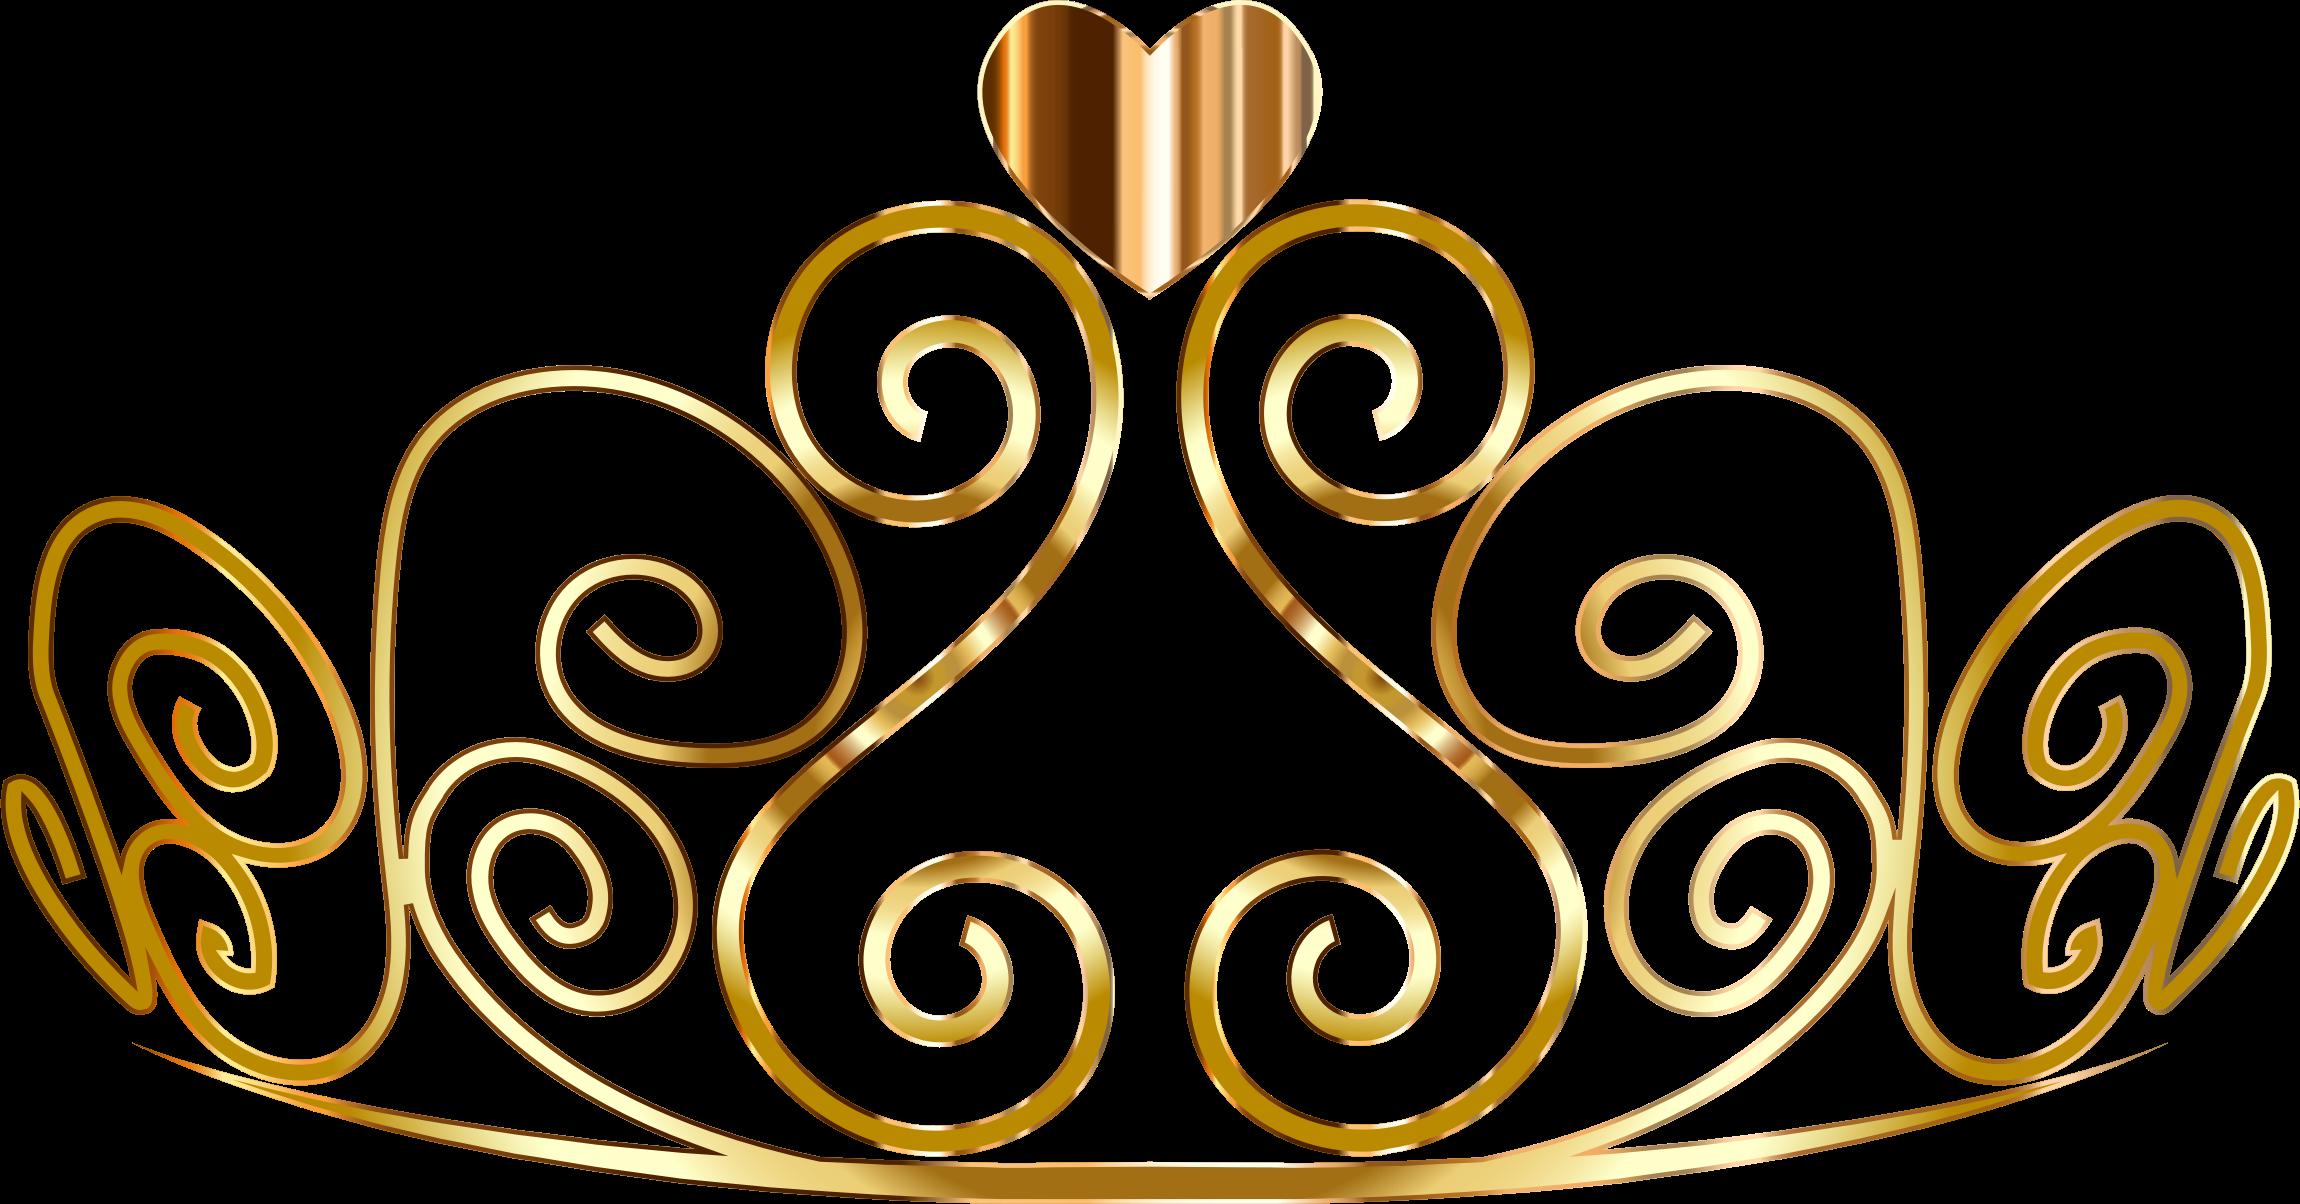 Crown clip art gold glitter. Princess clipart clipartxtras golden